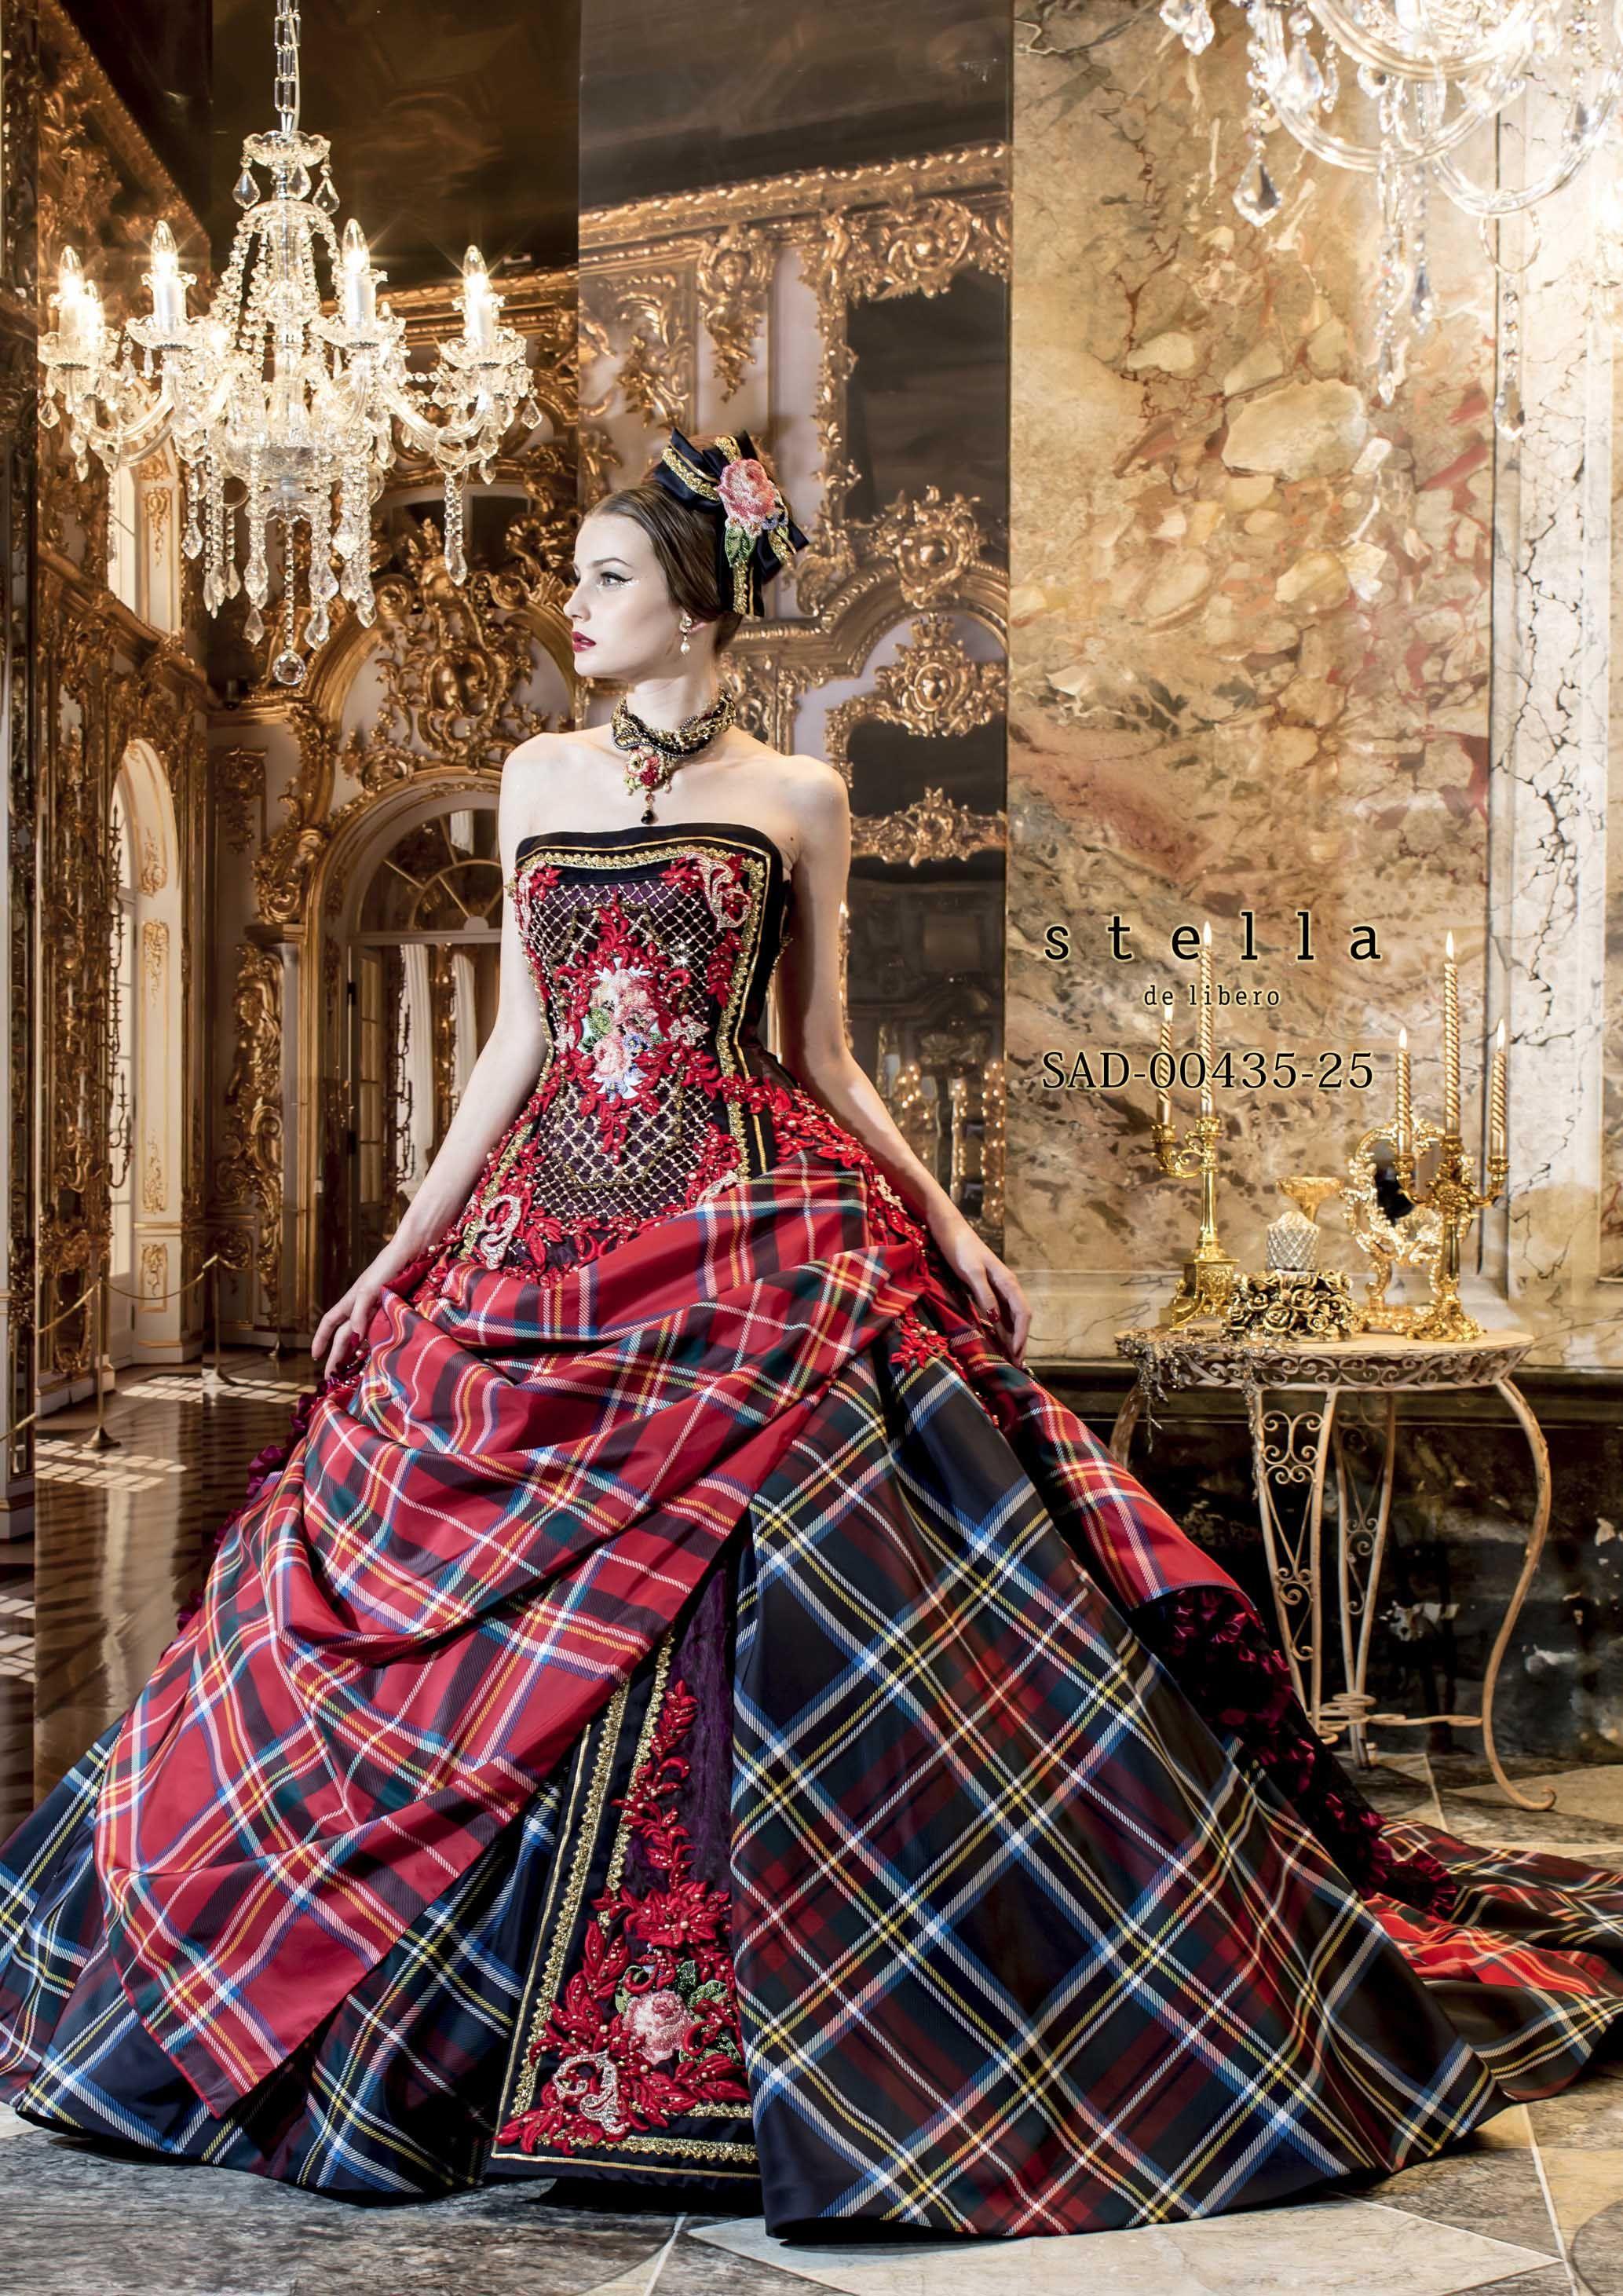 Scottish tartan wedding dress  Pin by Barb Wykle on Plaids in   Pinterest  Tartan Plaid and